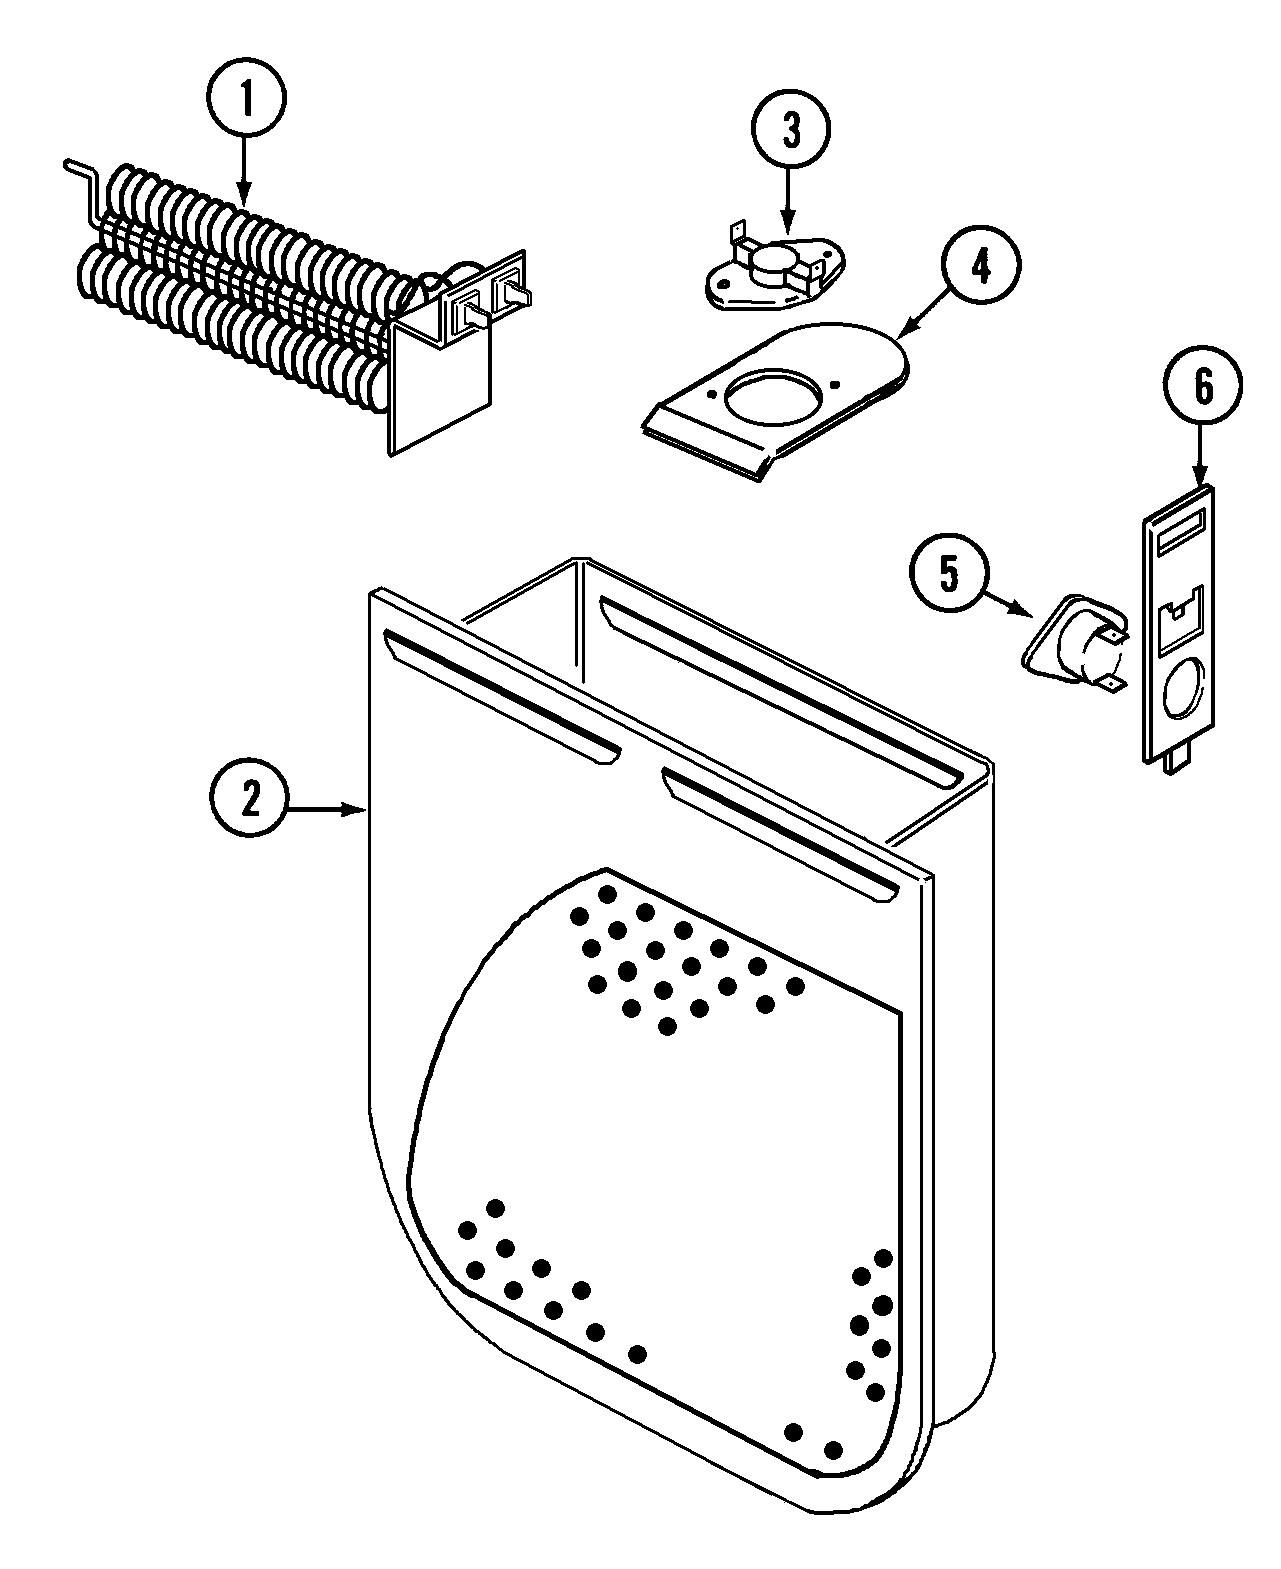 small resolution of maytag pye4500ayw heater diagram